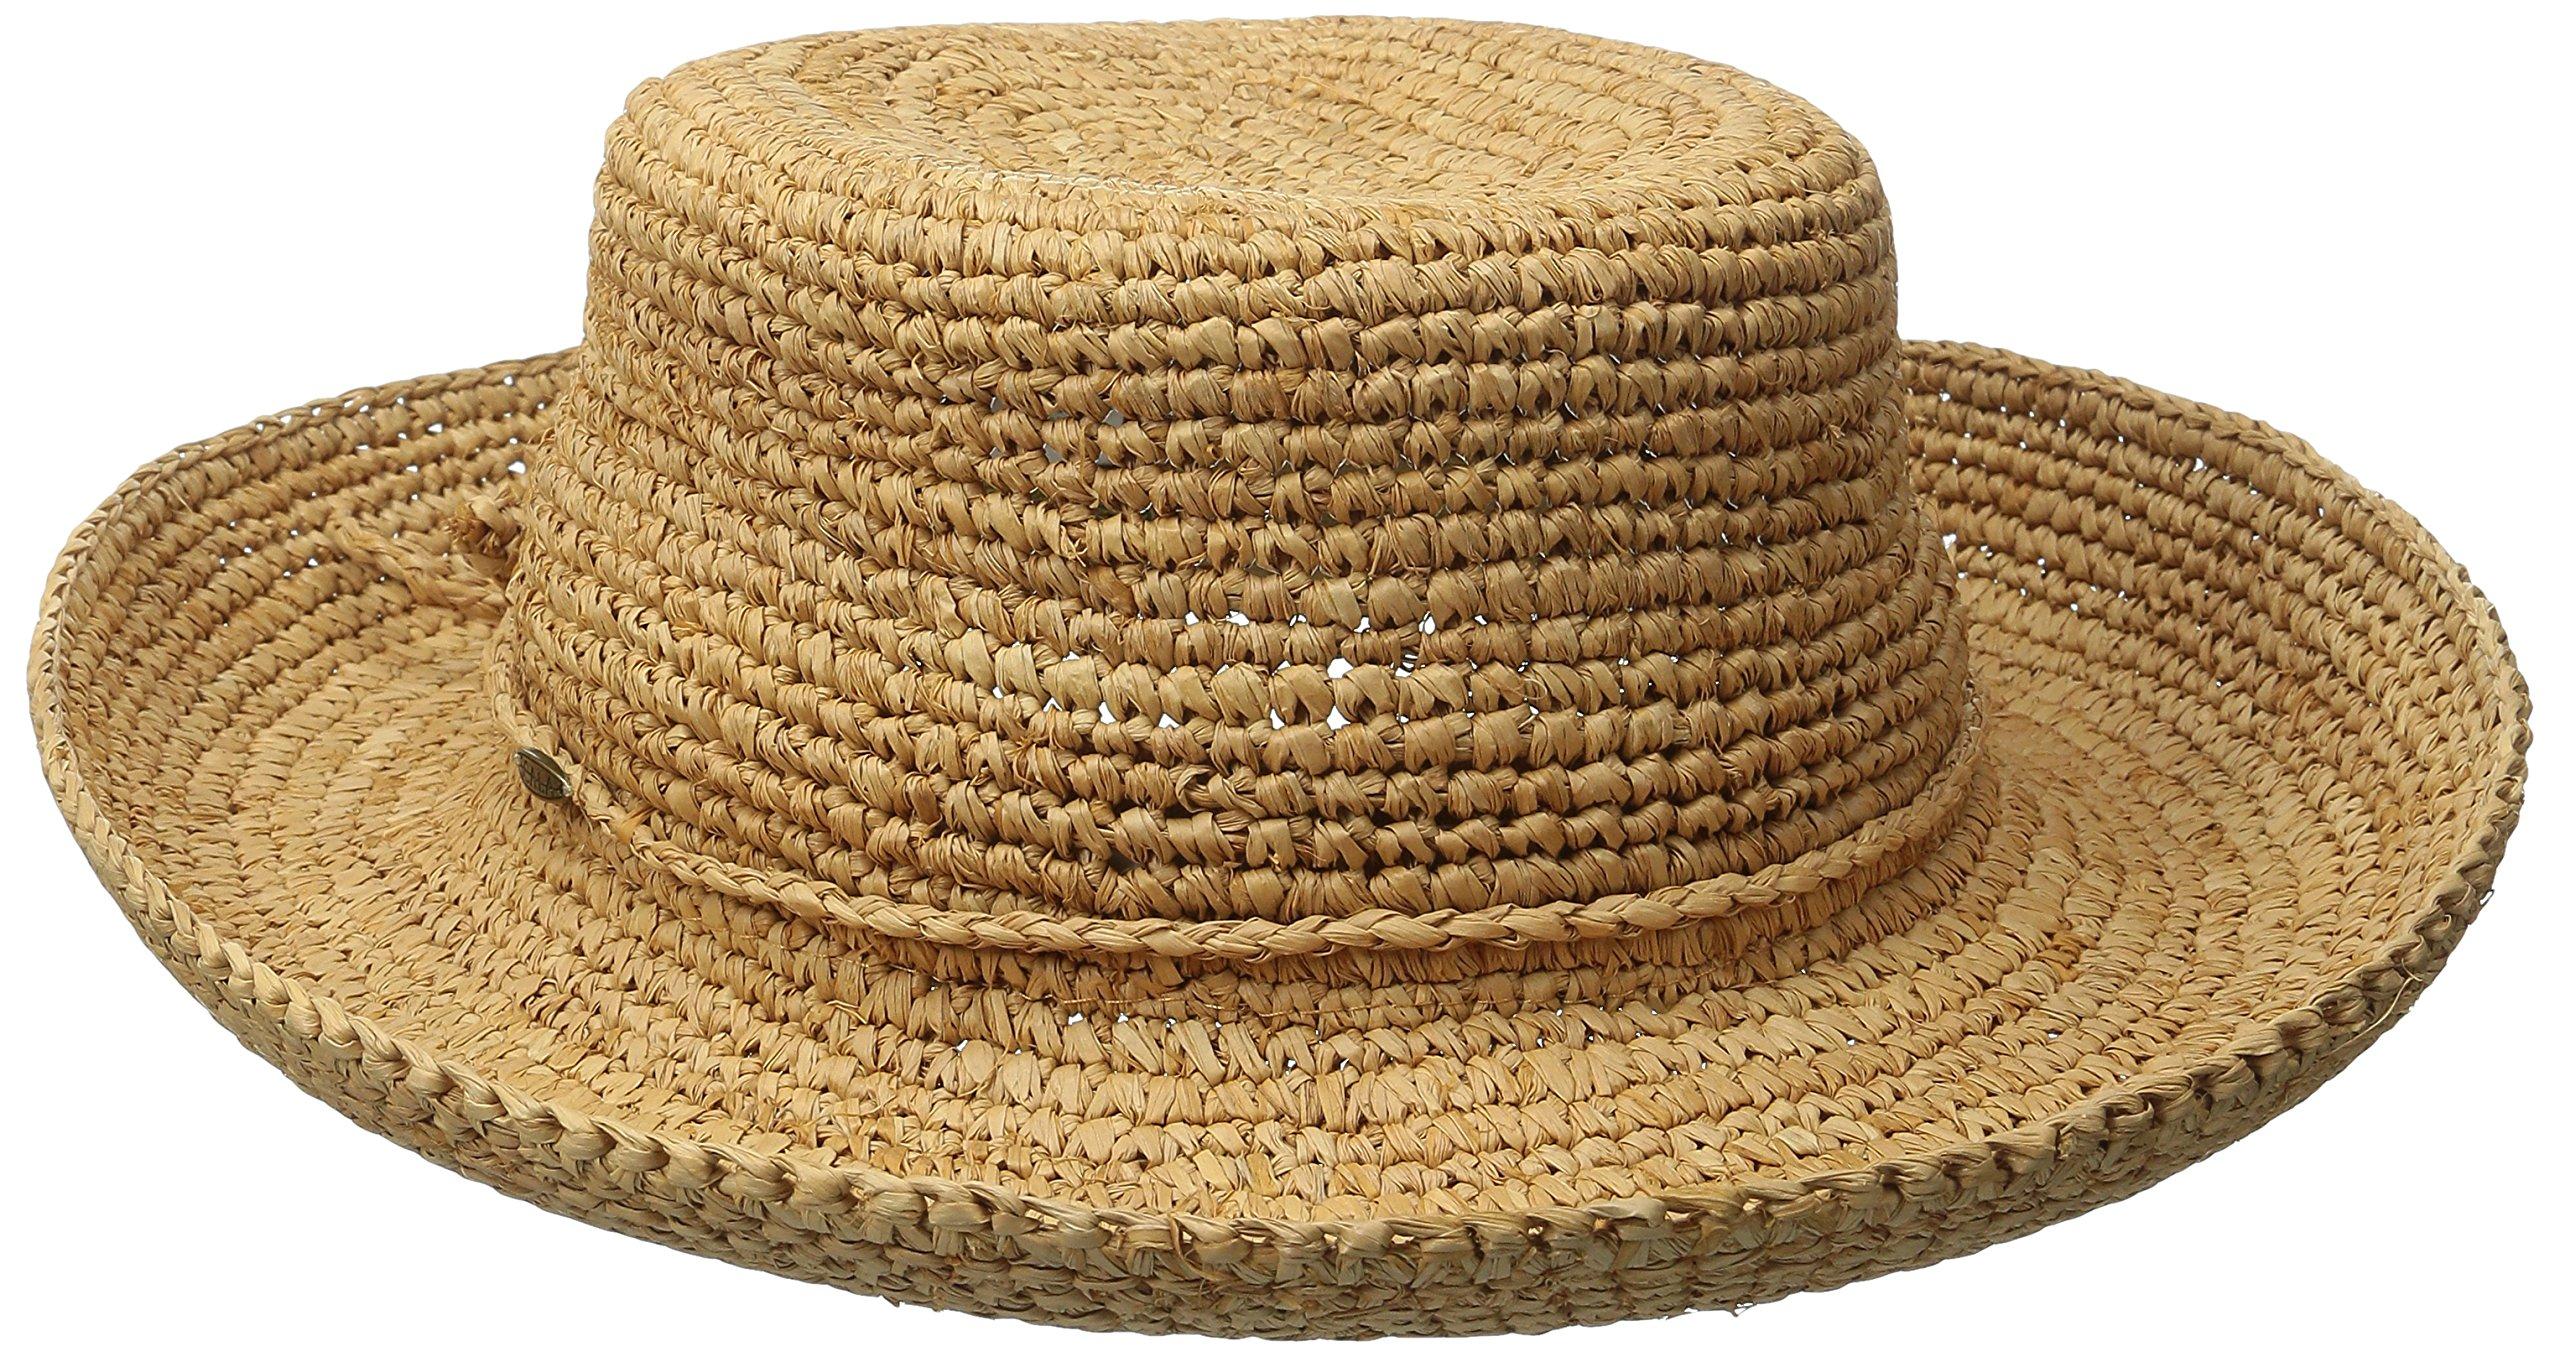 SCALA Women's Crocheted Raffia Hat with Drawstring, Tea, One Size